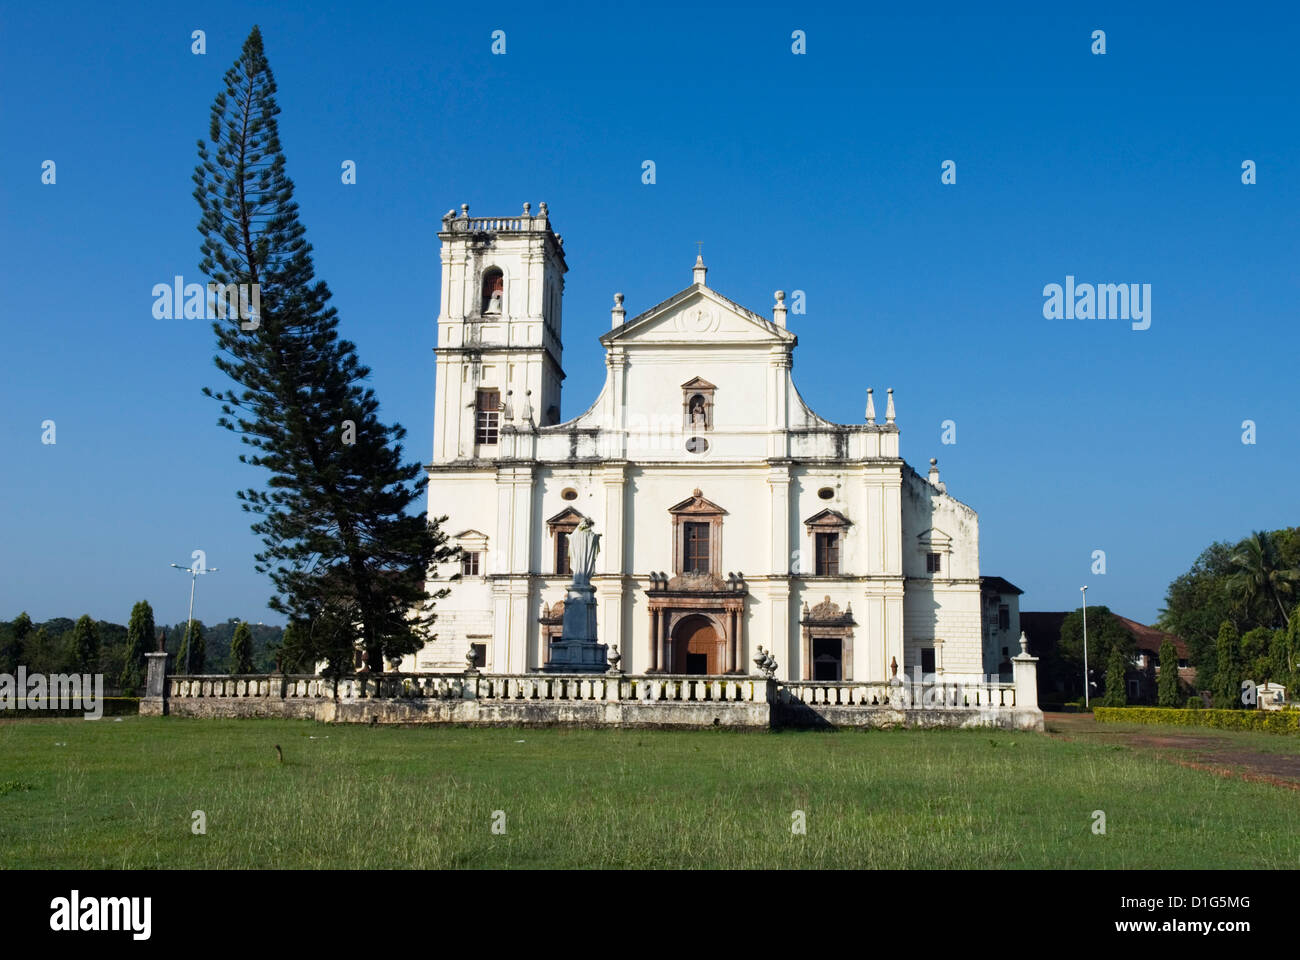 The Se (St. Catherine`s Cathedral), Old Goa, UNESCO World Heritage Site, Goa, India, Asia - Stock Image